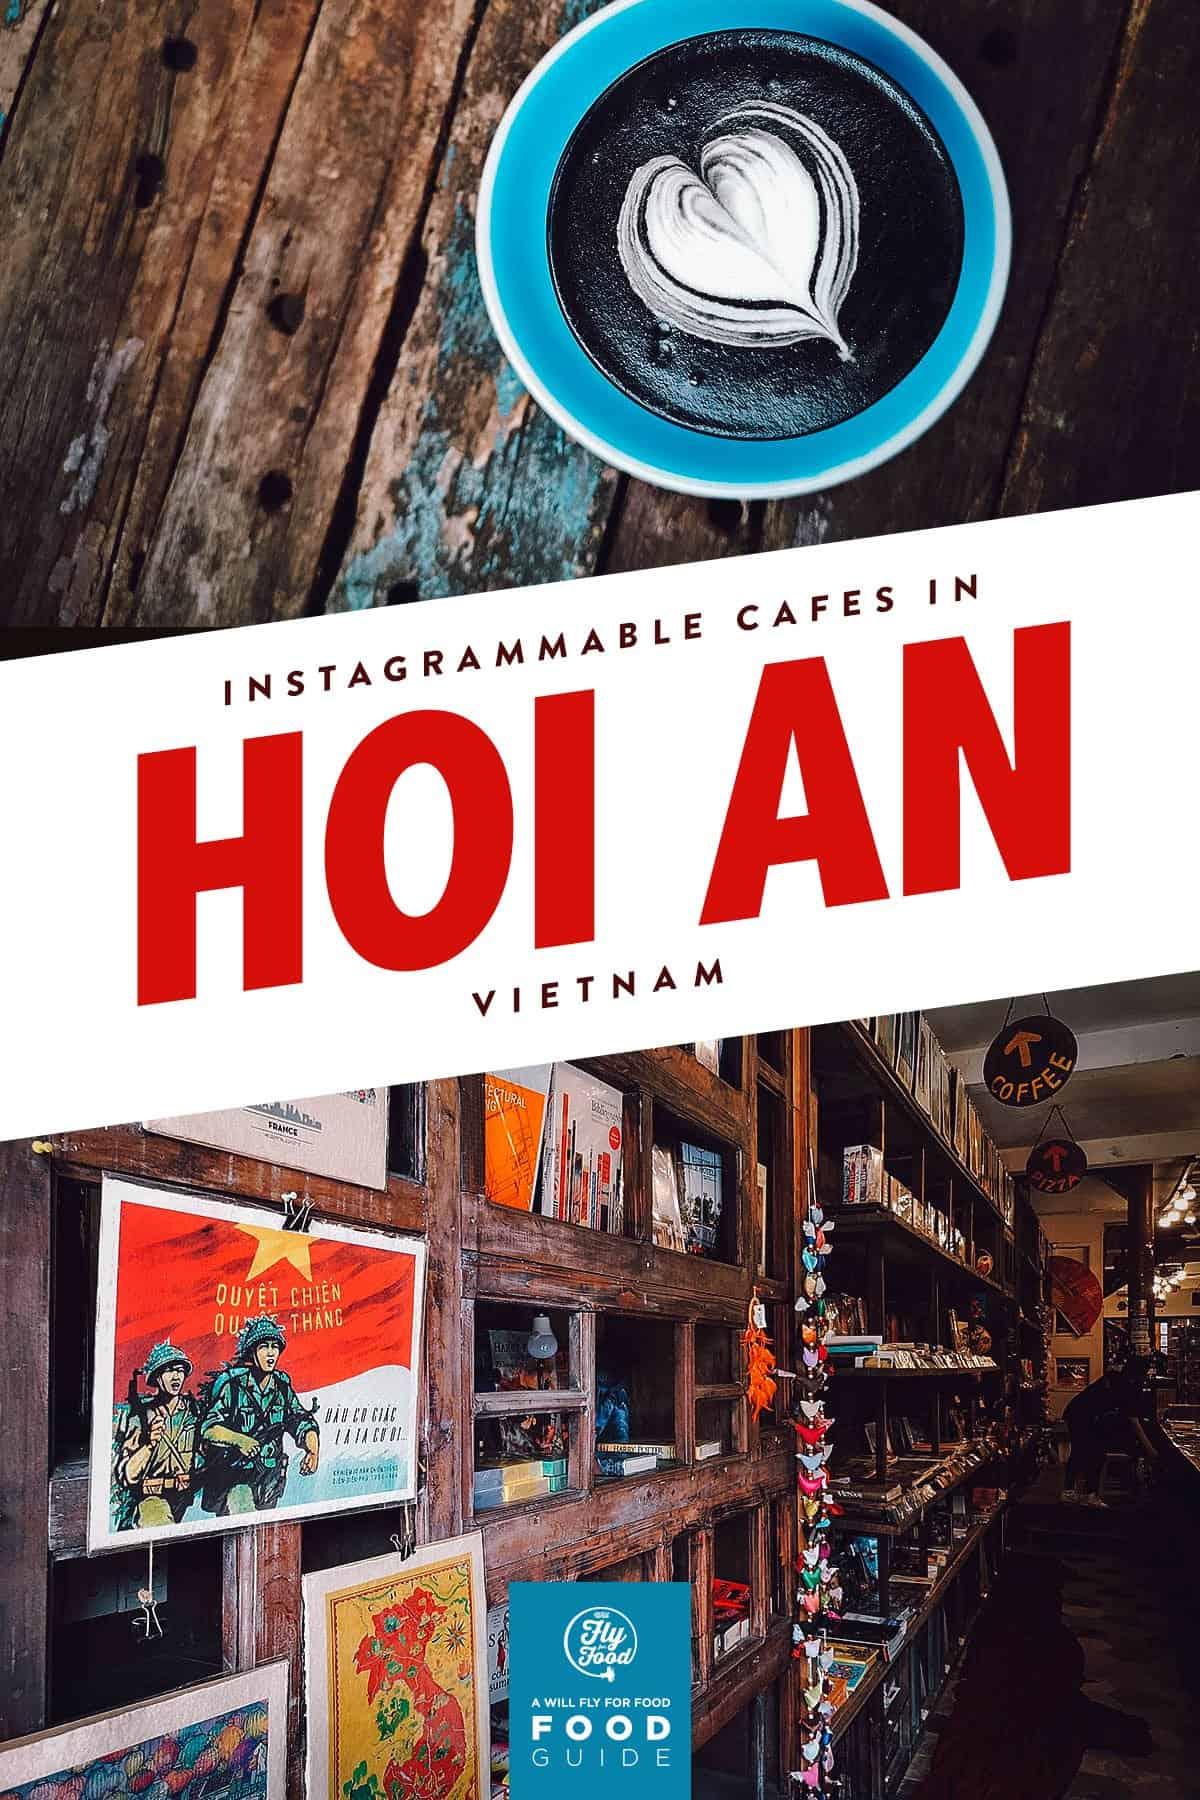 Coffee in Hoi An, Vietnam